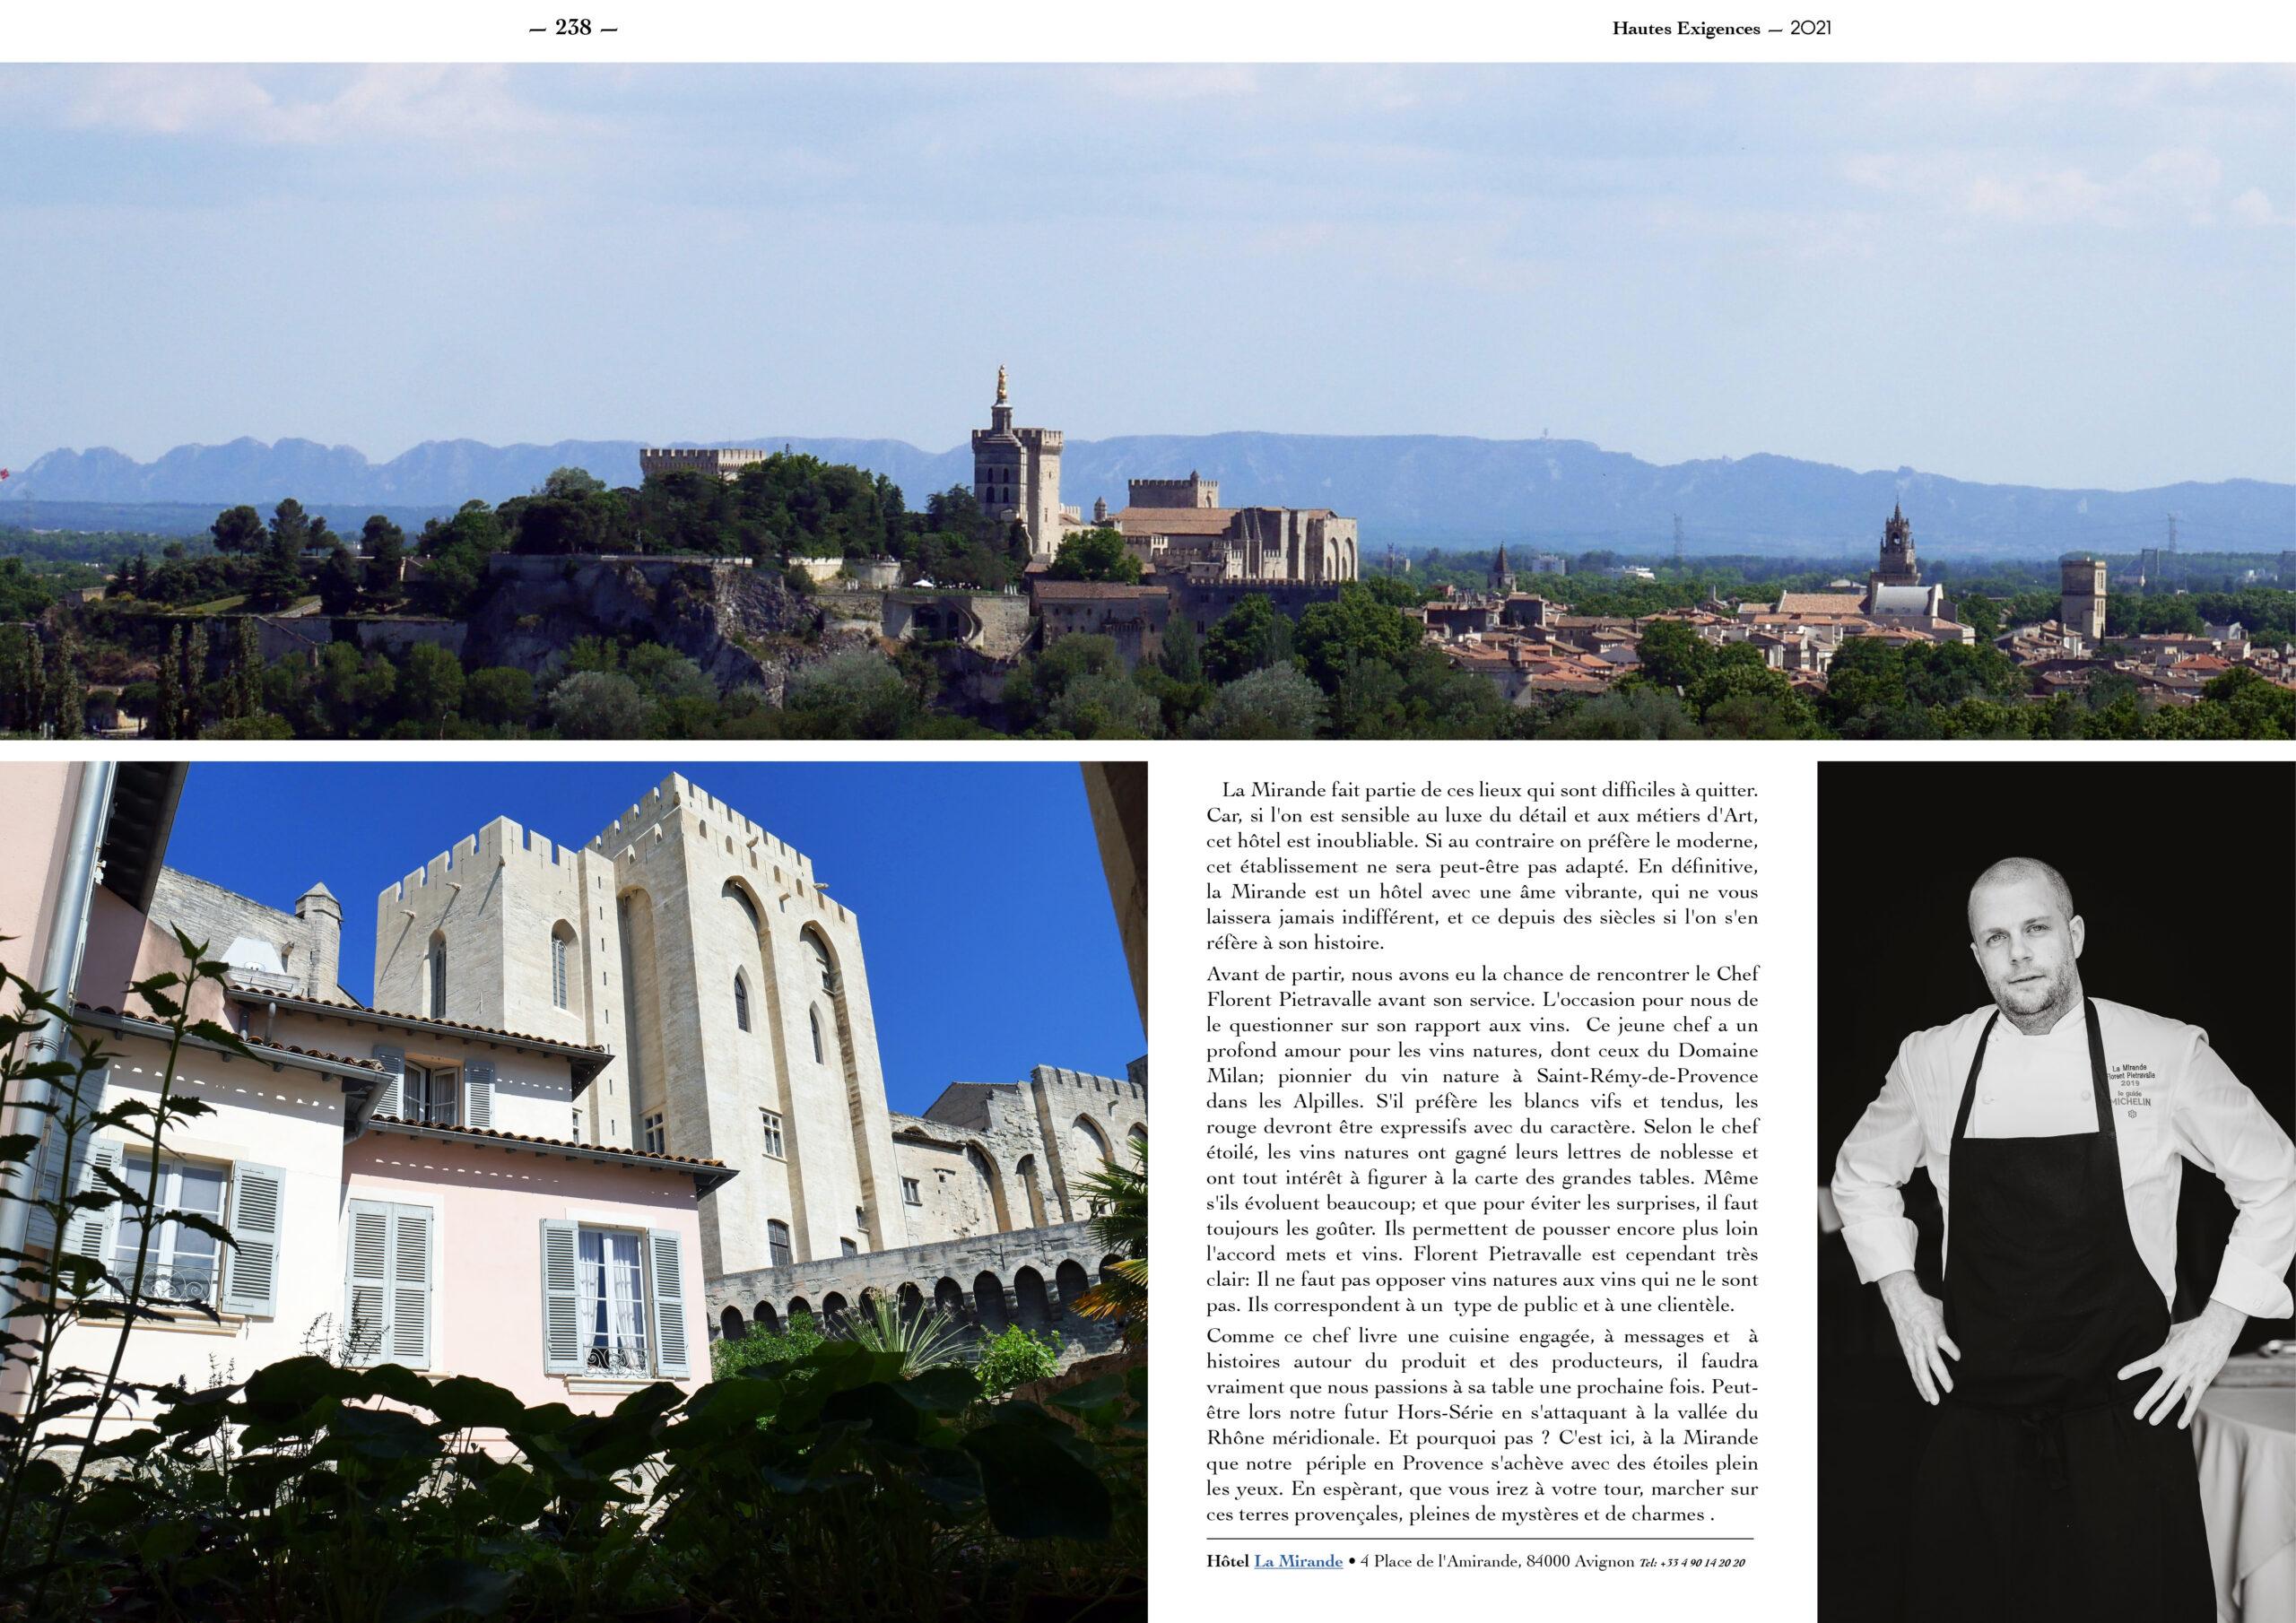 Hautes Exigences Magazine Hors Serie 2021 page 236-237